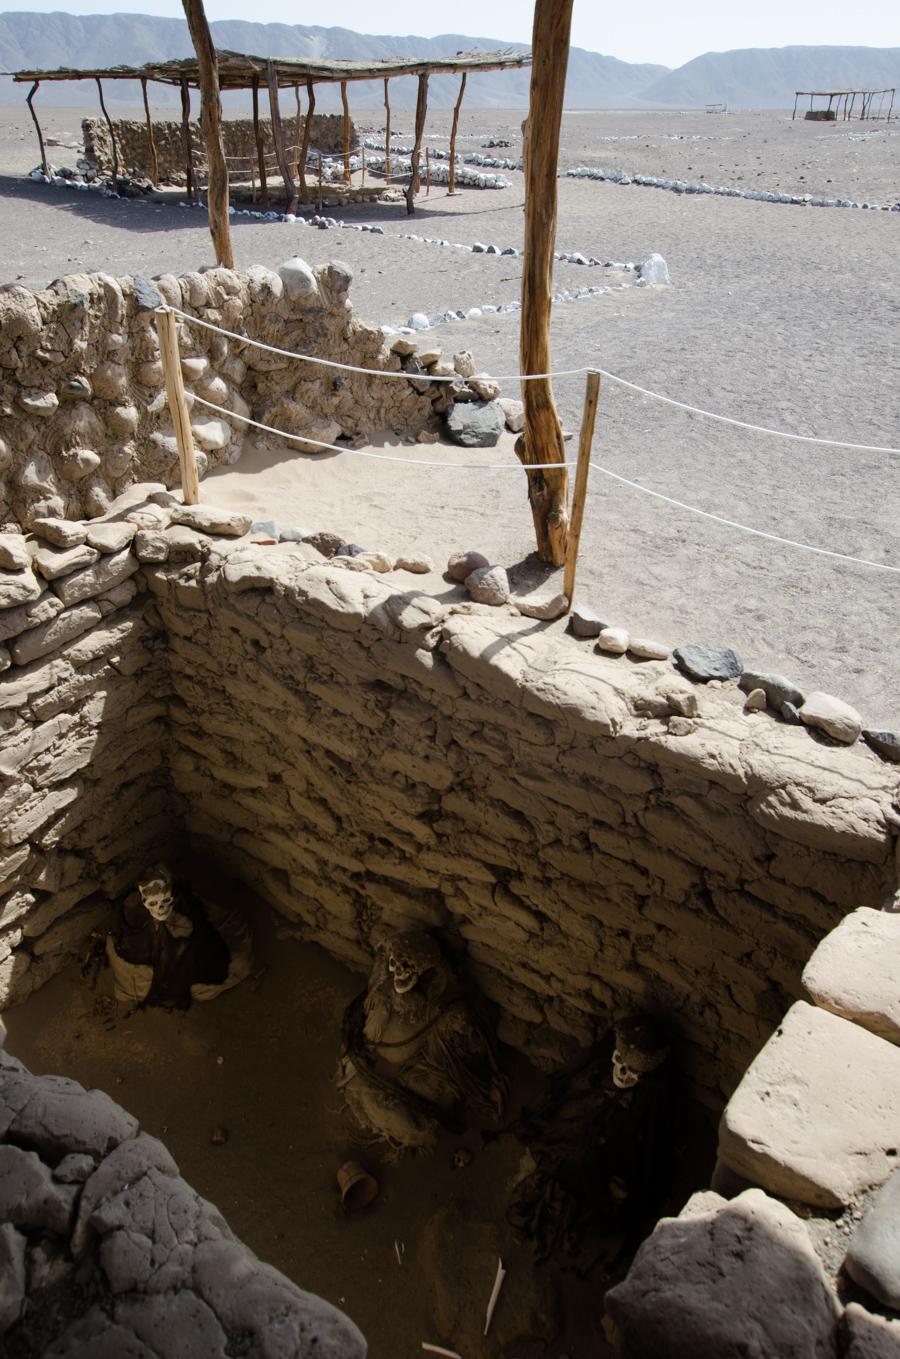 mummies in excavated tomb